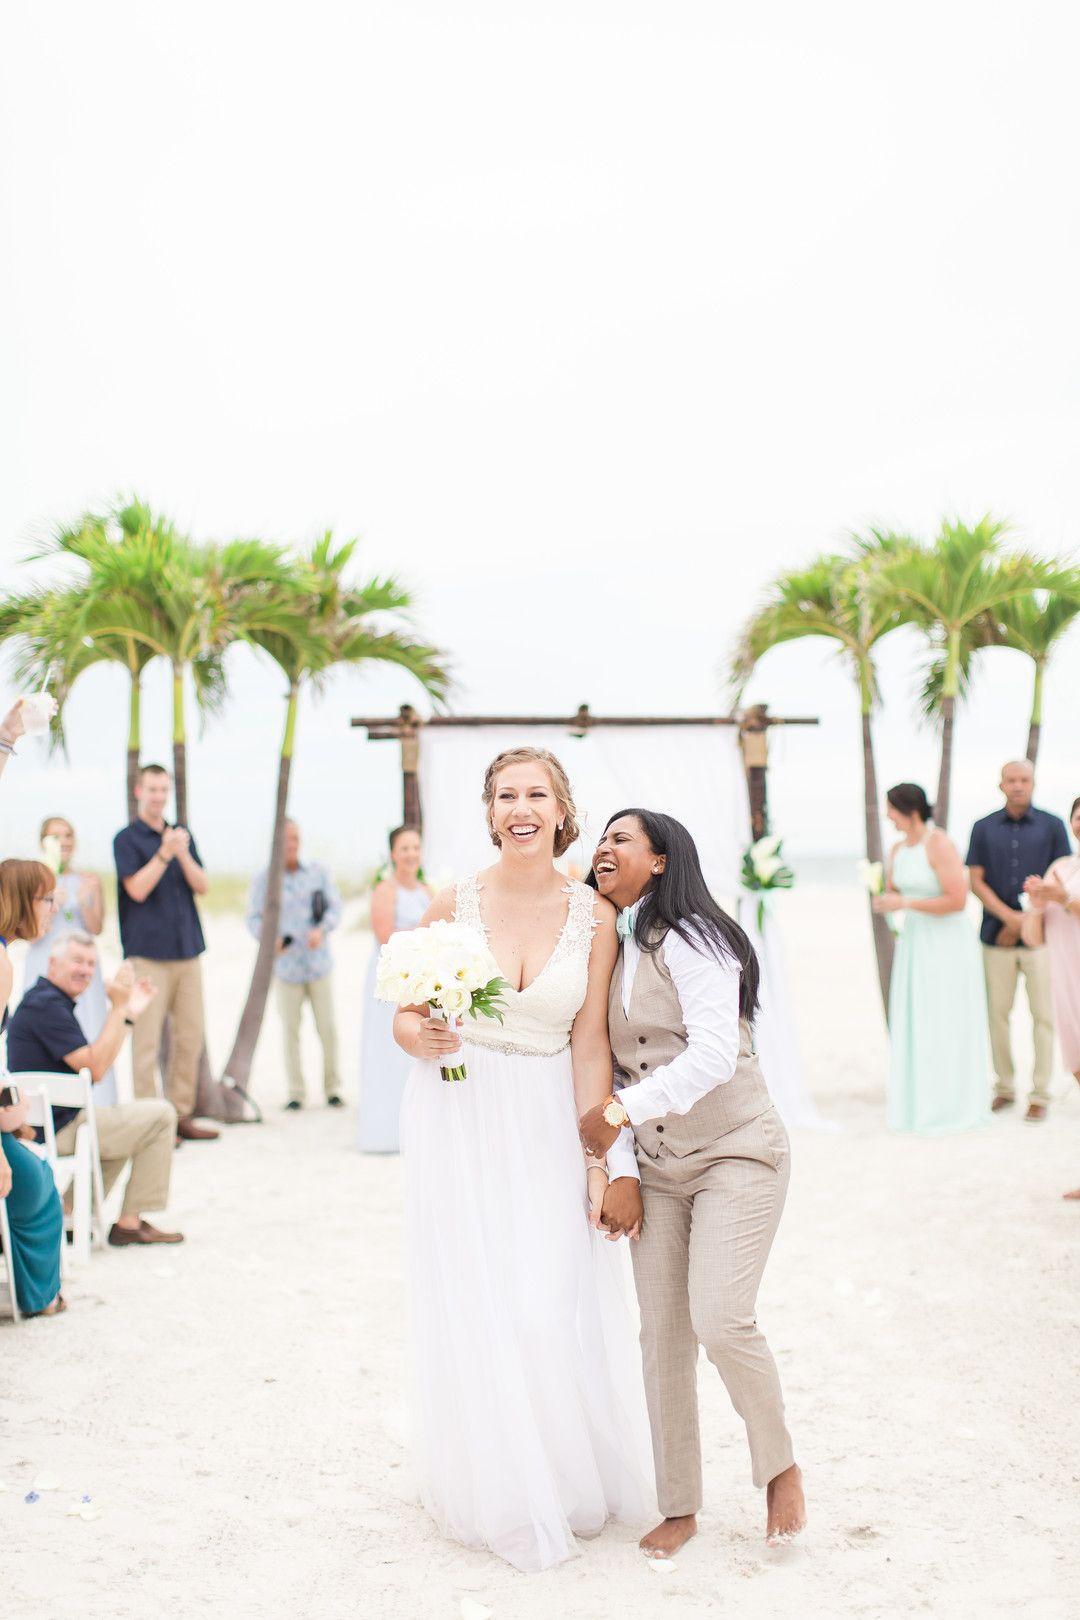 Tropical Blue And Green Beach Wedding In St Petersburg Florida Lesbian Beach Wedding Beach Wedding White Beach Wedding Bridesmaids [ 1620 x 1080 Pixel ]